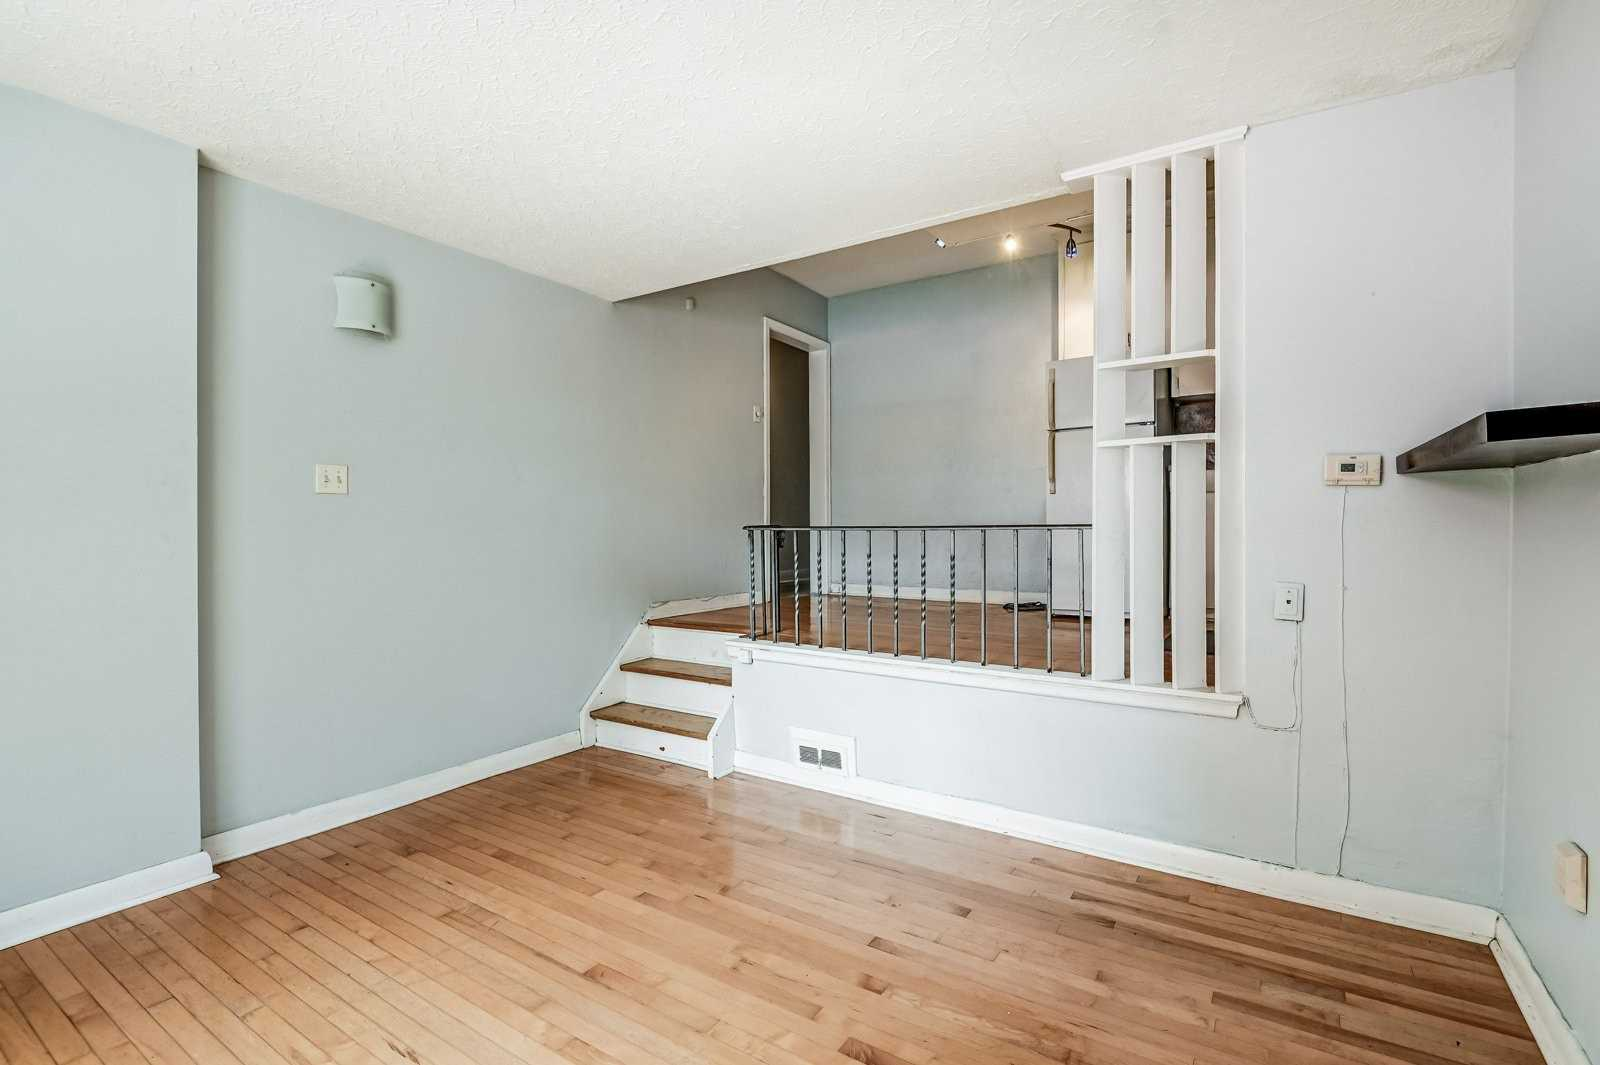 24 Kewbeach Ave, Toronto, Ontario M4L 1B7, 2 Bedrooms Bedrooms, 6 Rooms Rooms,3 BathroomsBathrooms,Duplex,For Sale,Kewbeach,E5327108